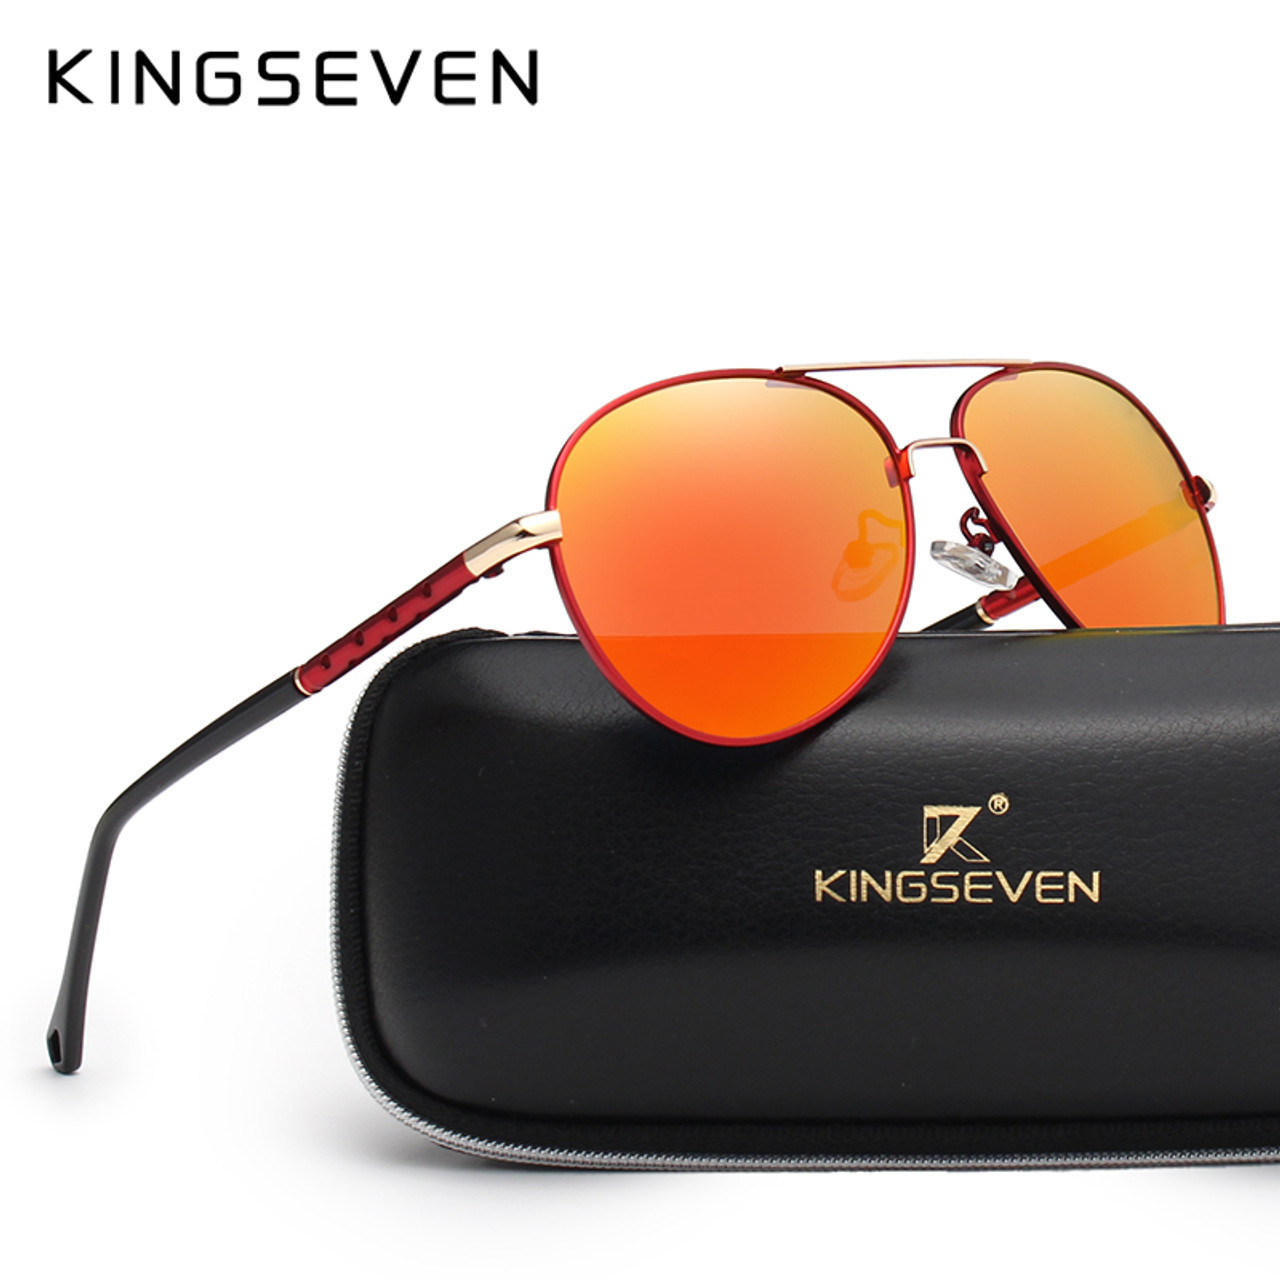 4689b3a906ae KINGSEVEN Brand Design Pilot Sunglasses Men and Women Polarized Mirror  Hollow Frame UV Glass Goggles For ...